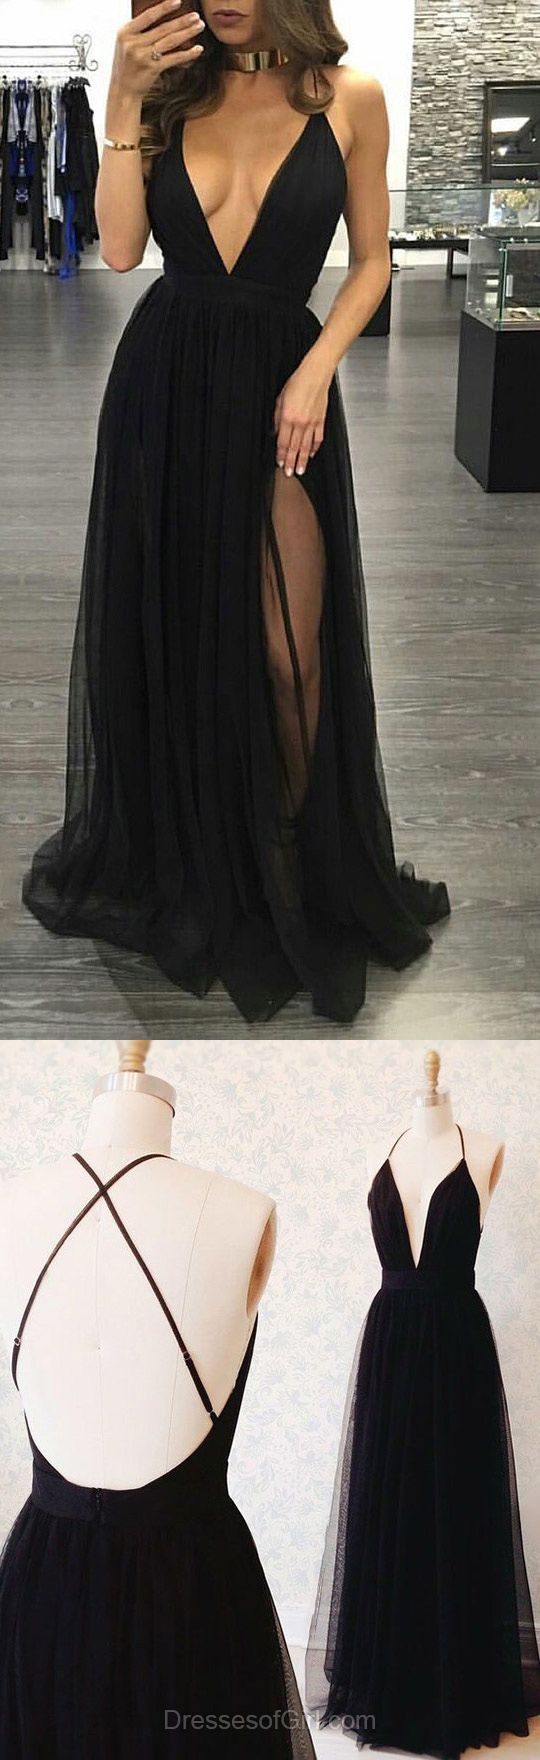 Hot A-line V-neck Tulle Floor-length Split Front Black Backless Prom Dresses